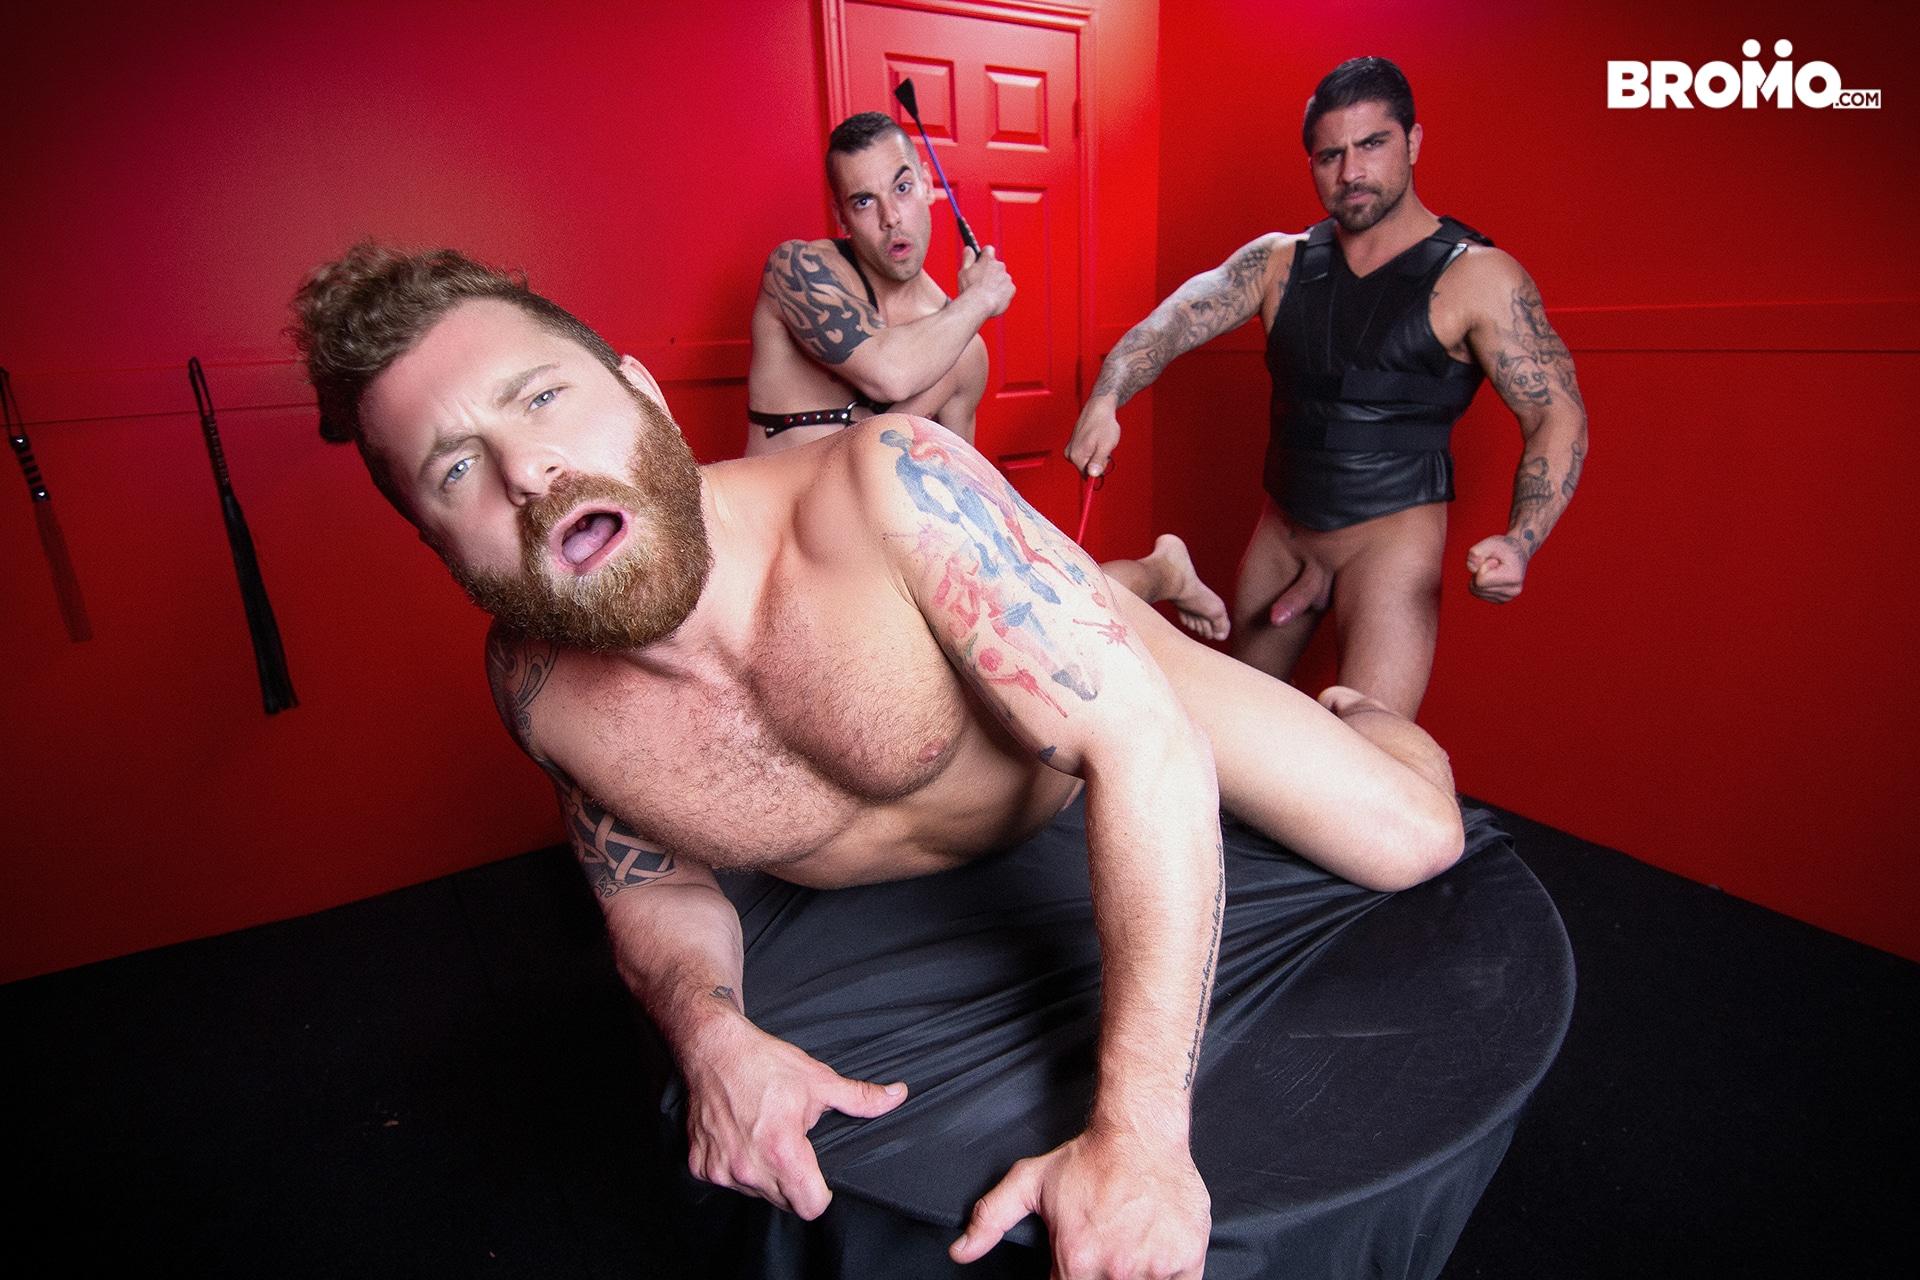 Ryan Bones threesome gay porn